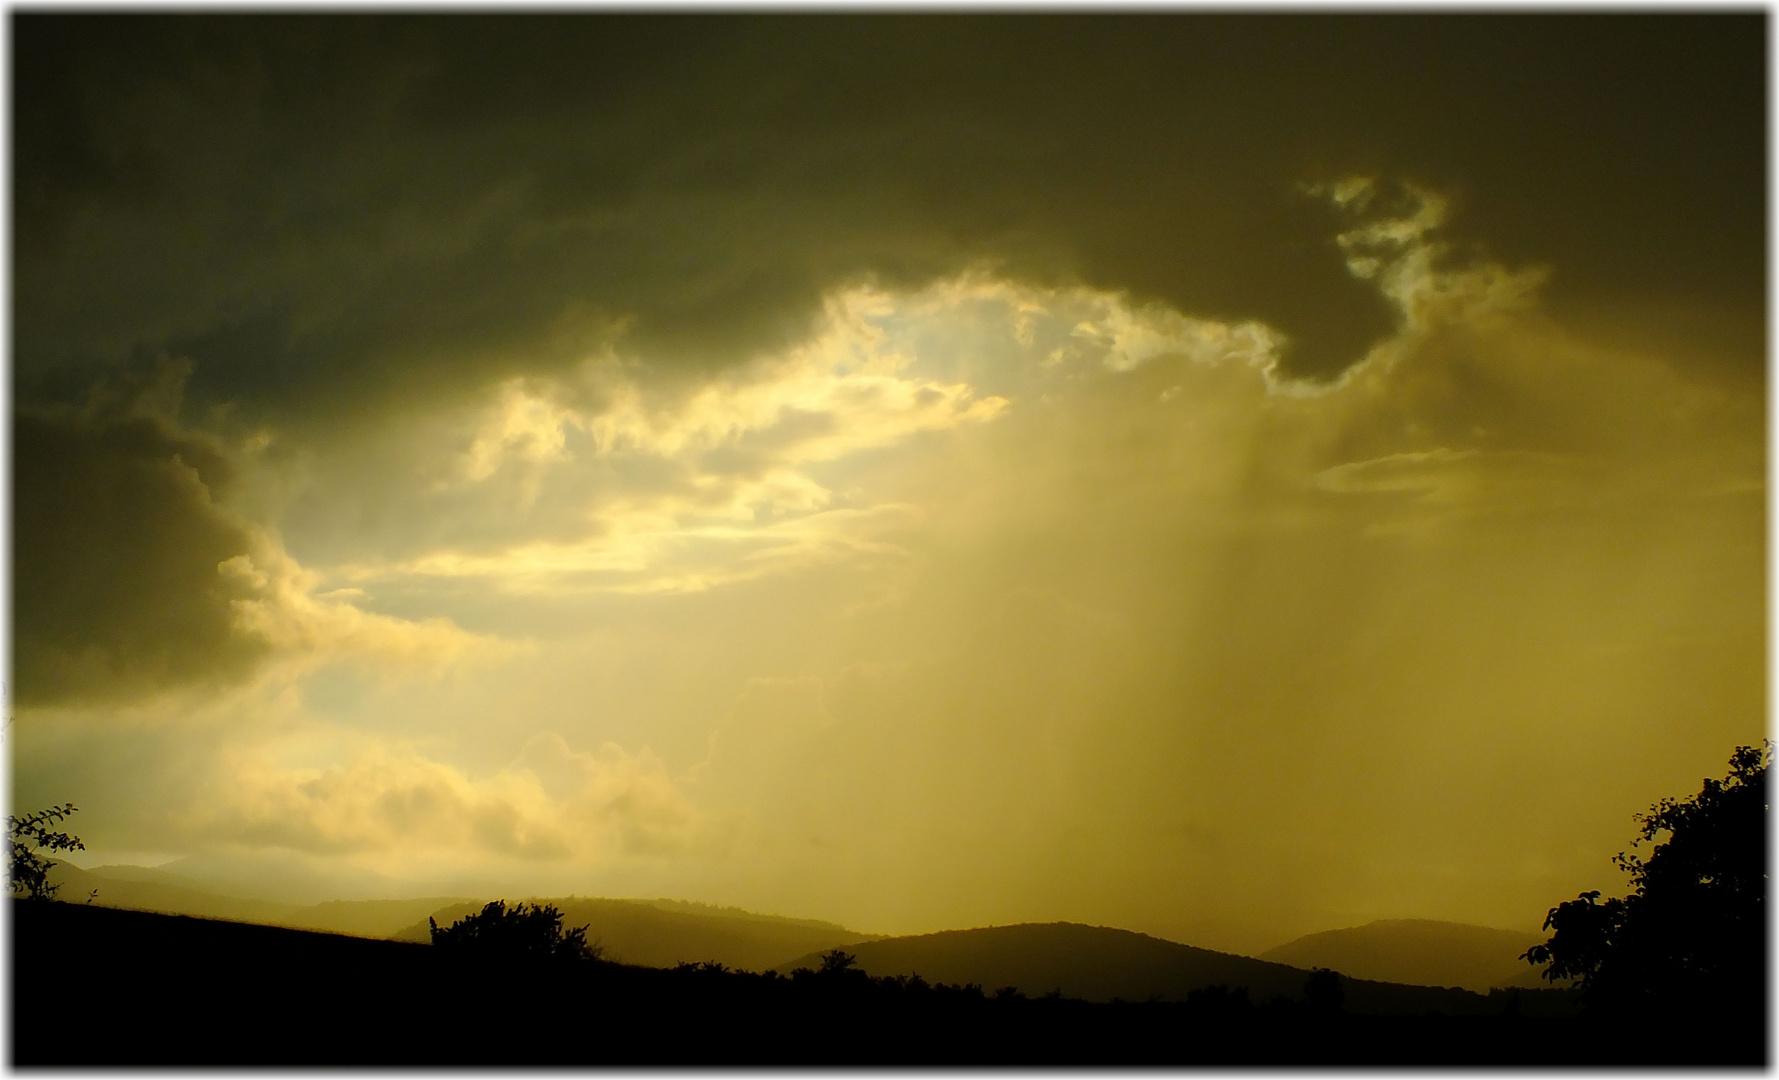 Rain over mountains.